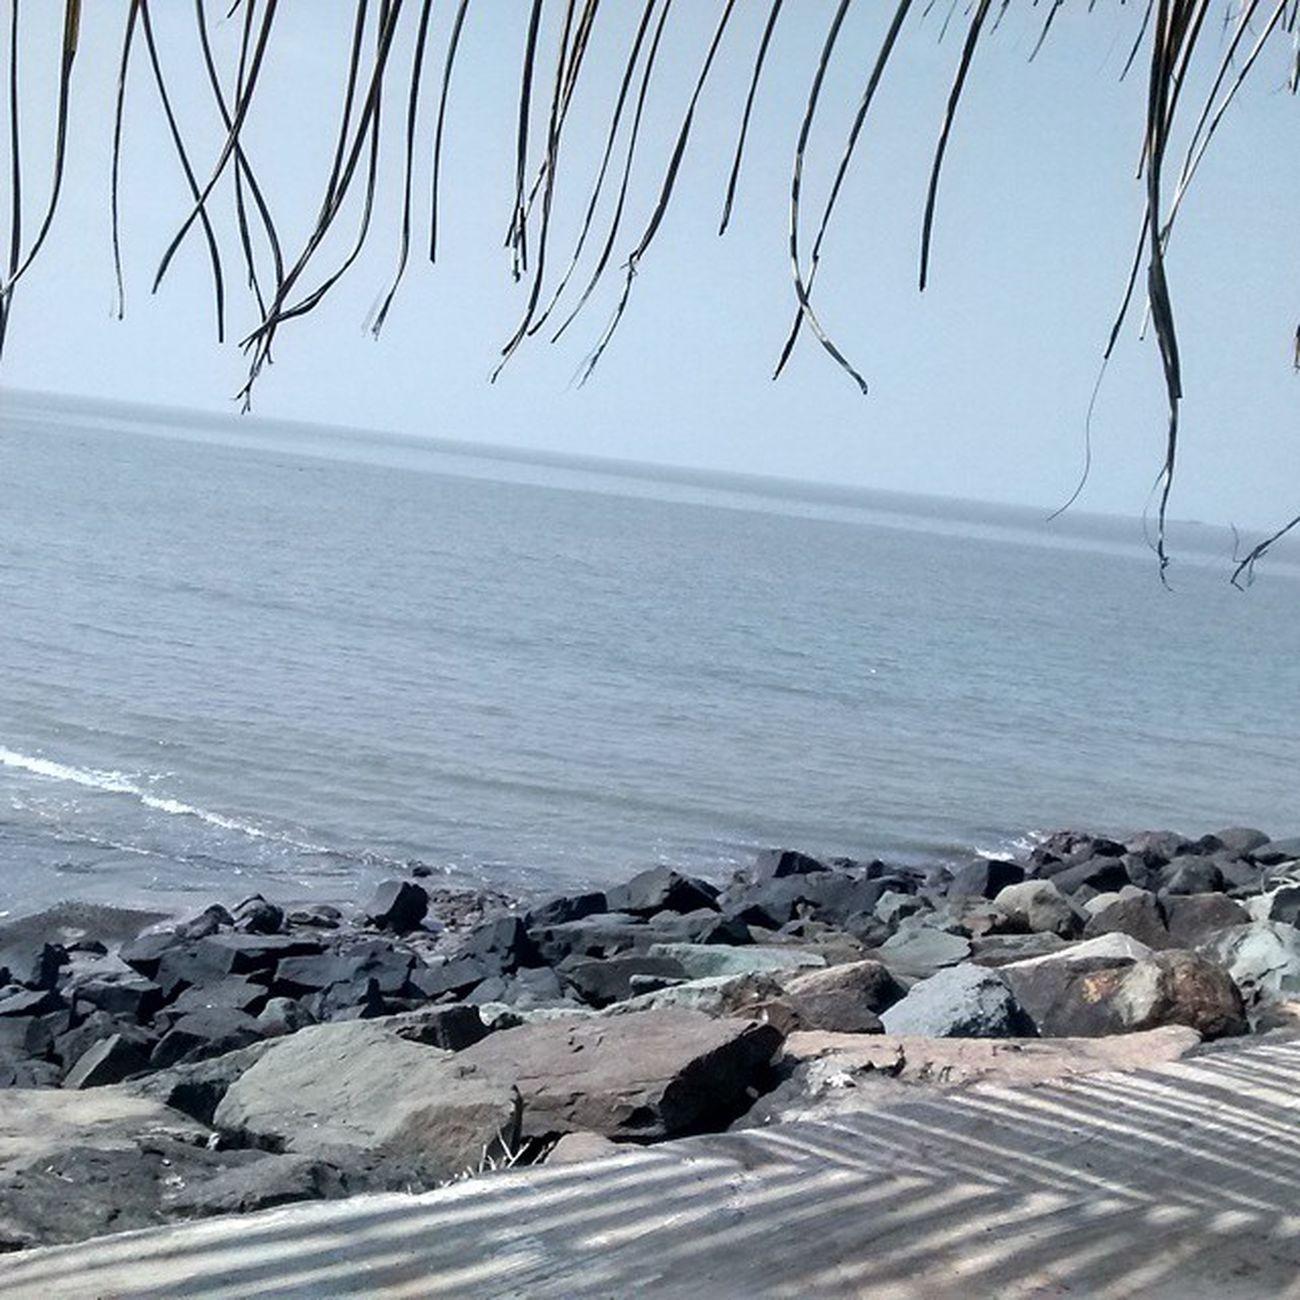 Gorai Beach Friends Enjoying Peace ✌🍻🍻🏊